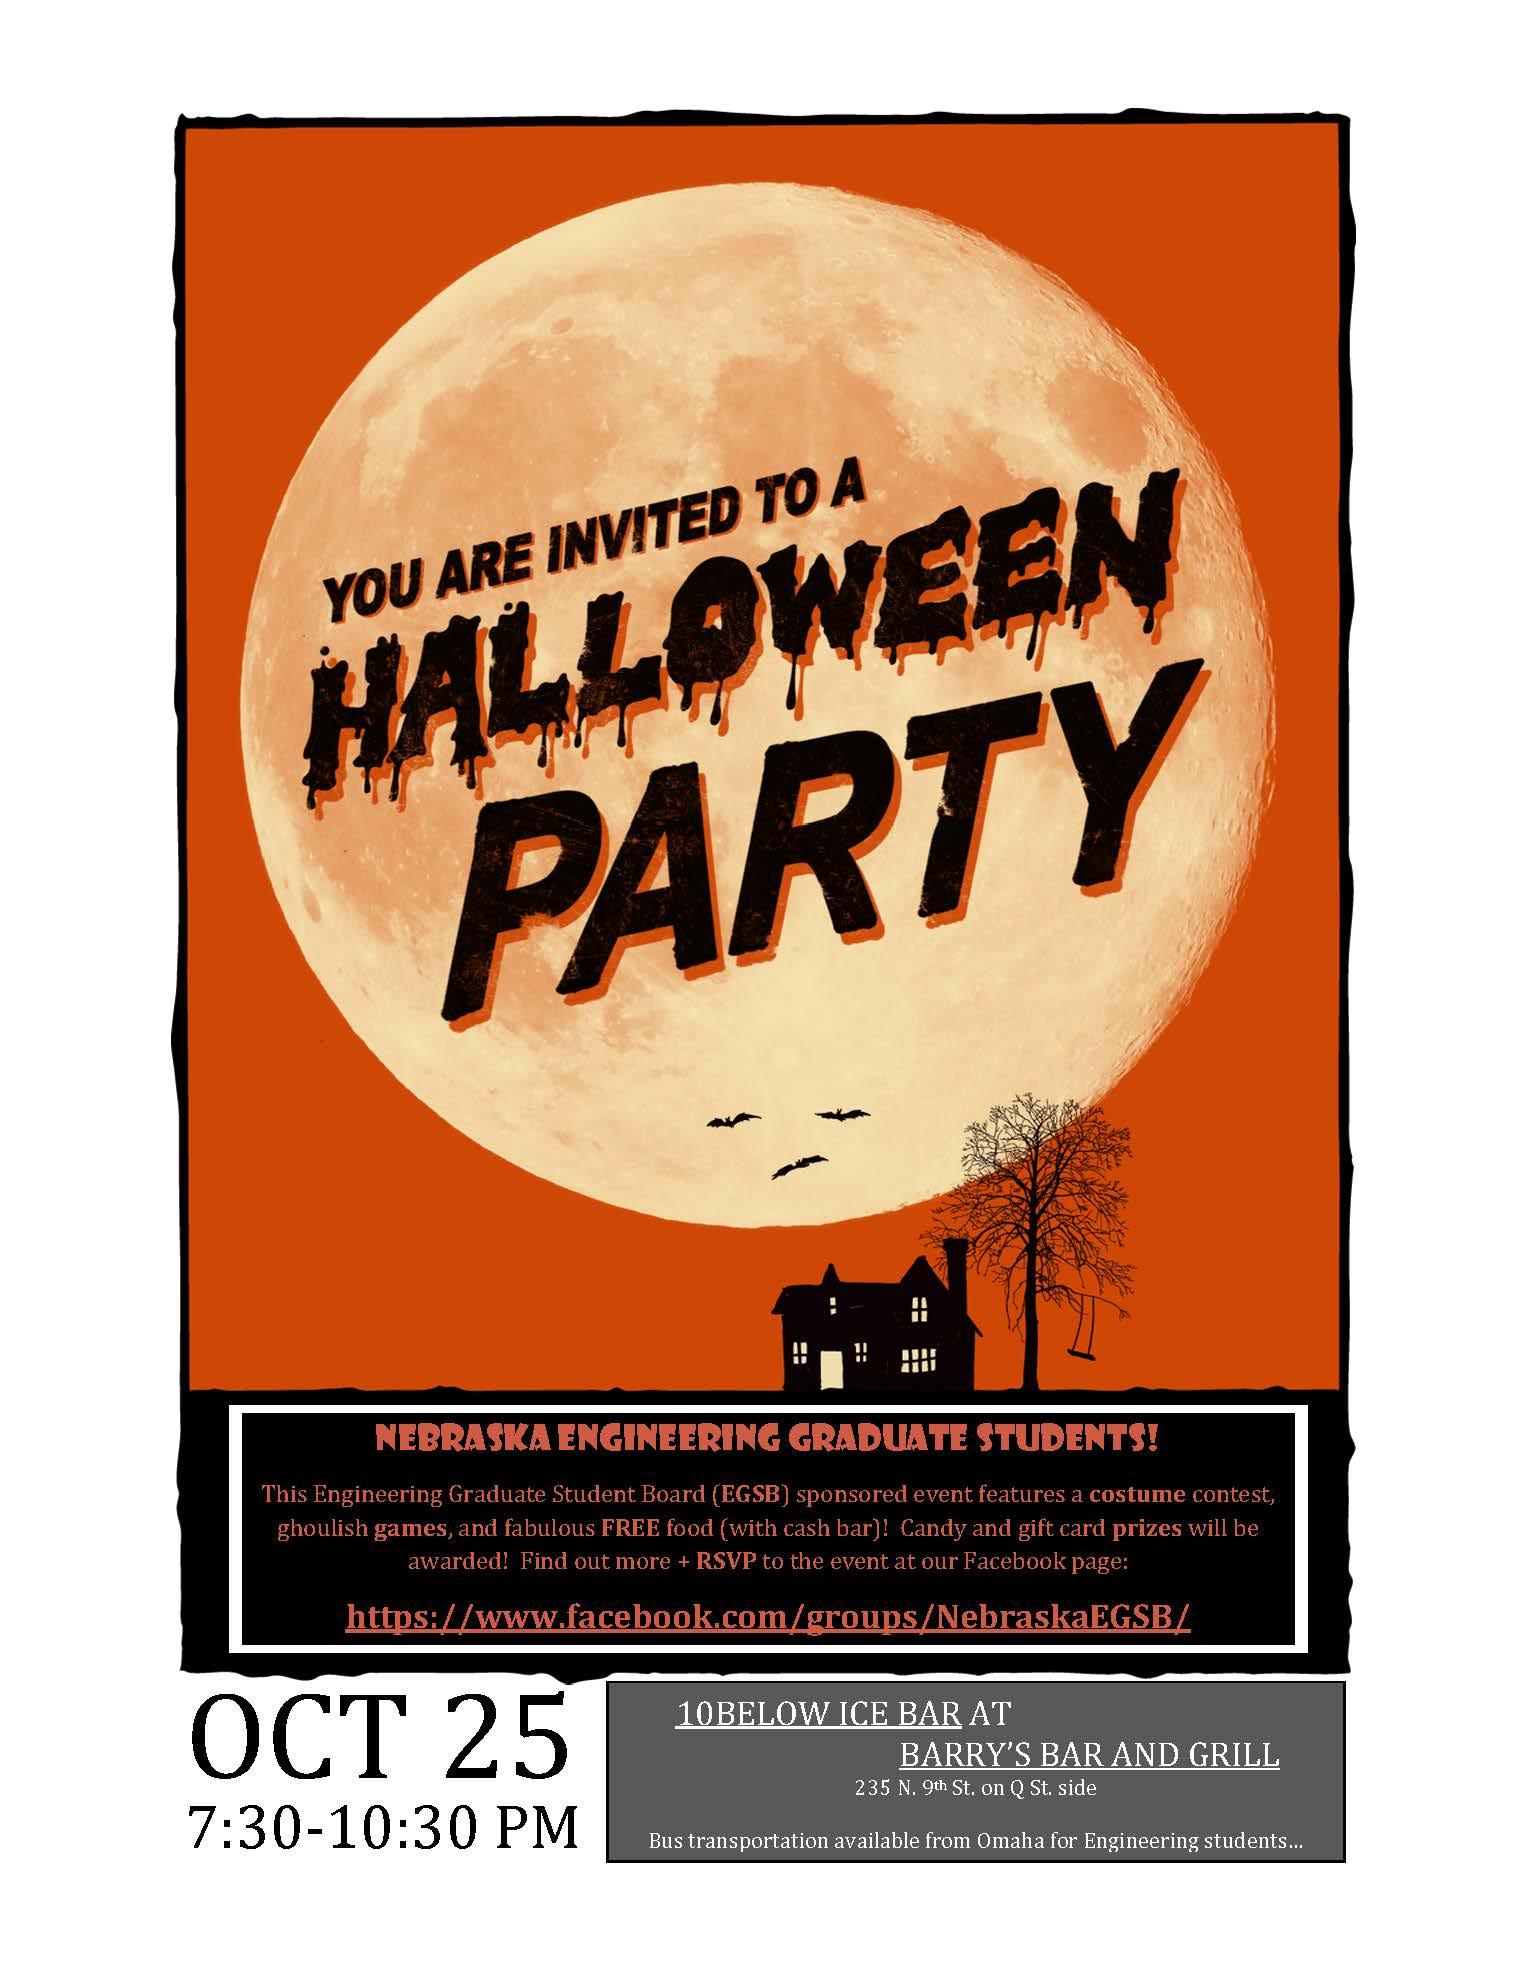 nebraska engineering graduate student halloween party is friday night oct 25 at barrys in